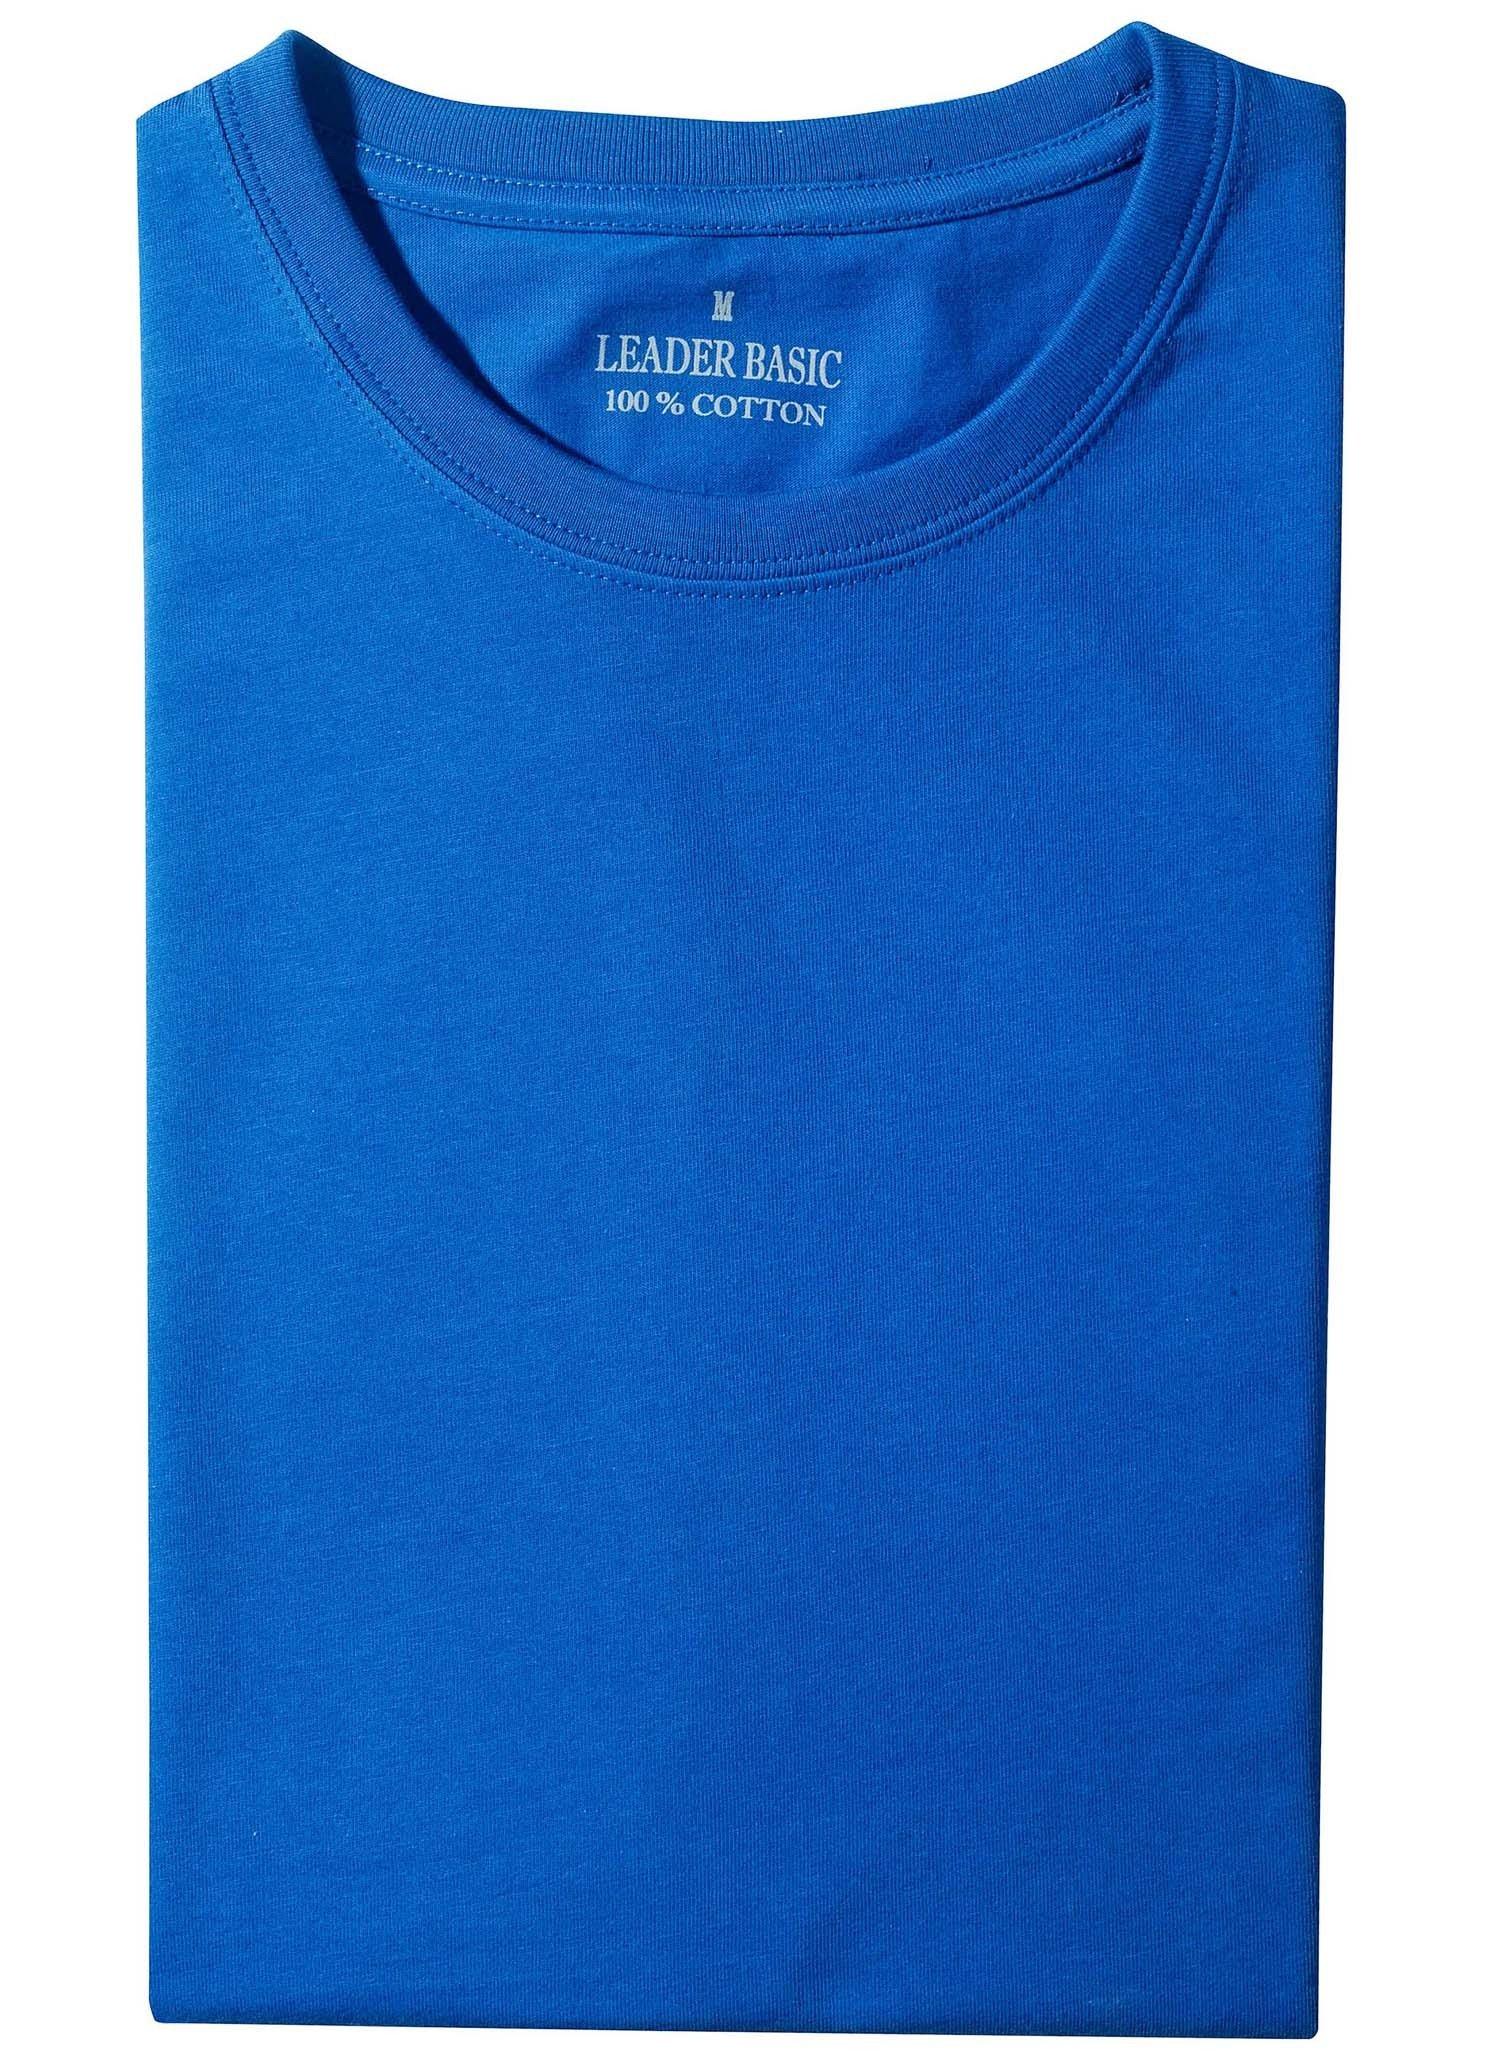 U-Duo-Pack-Shirt k'blau XXXL 052 - 1 - Ronja.ch